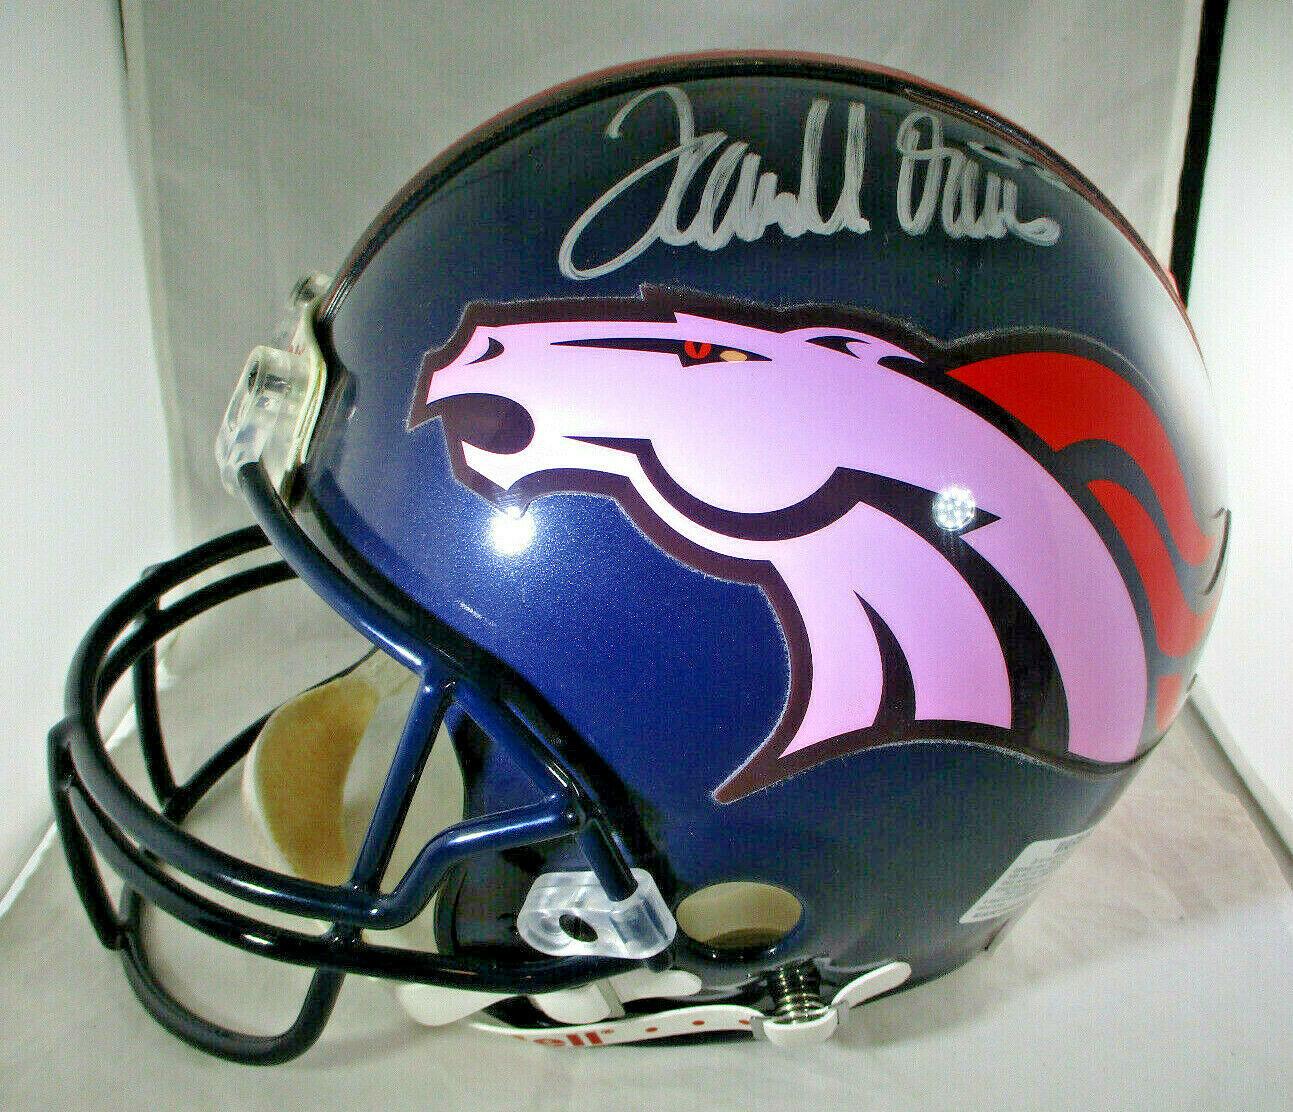 TERRELL DAVIS / AUTOGRAPHED DENVER BRONCOS NFL PRO LINE FOOTBALL HELMET / COA